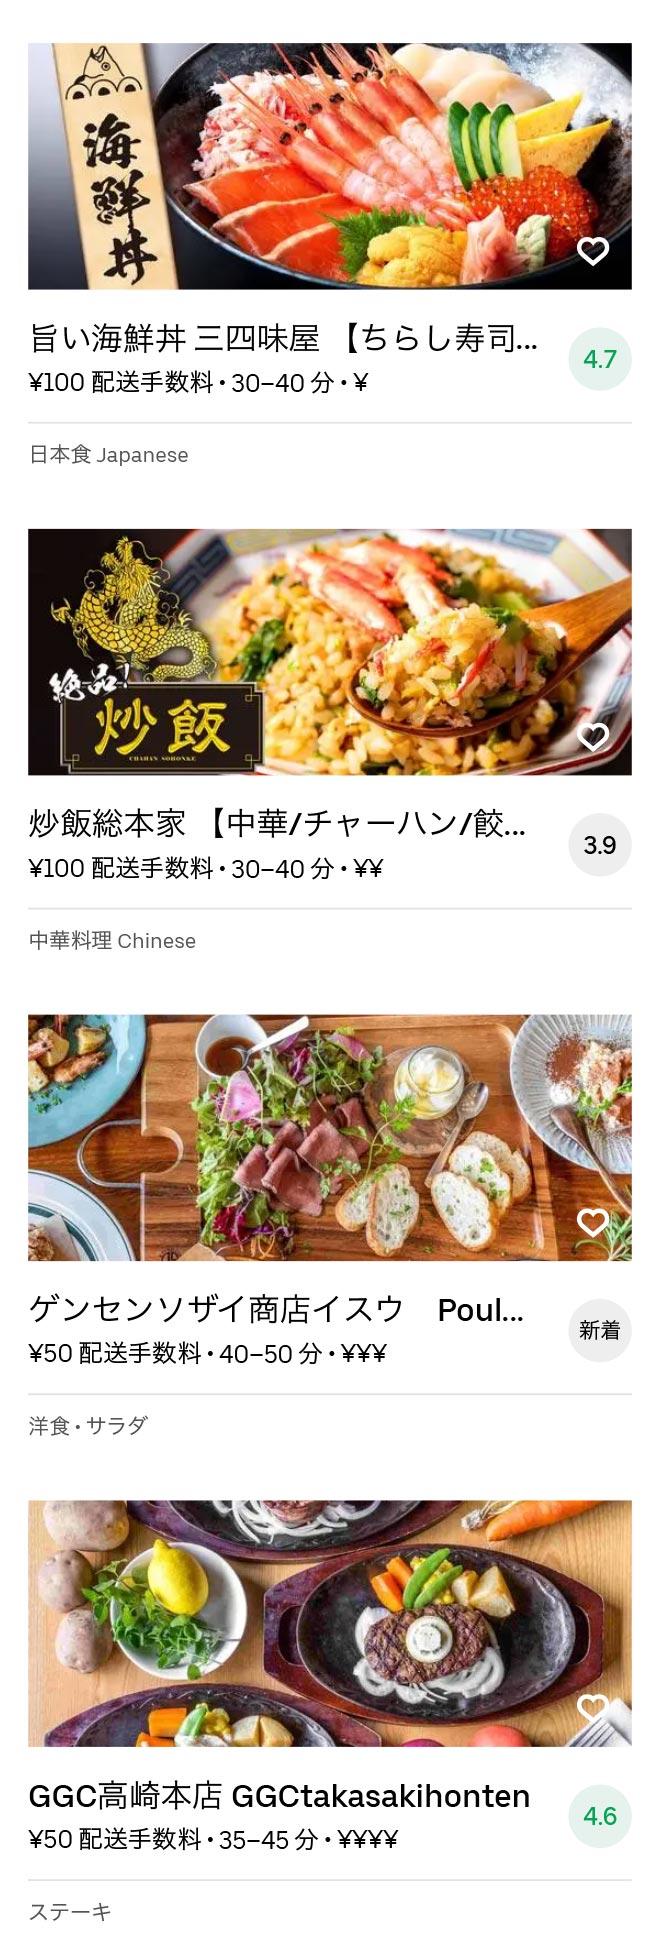 Tonyamachi menu 2010 08